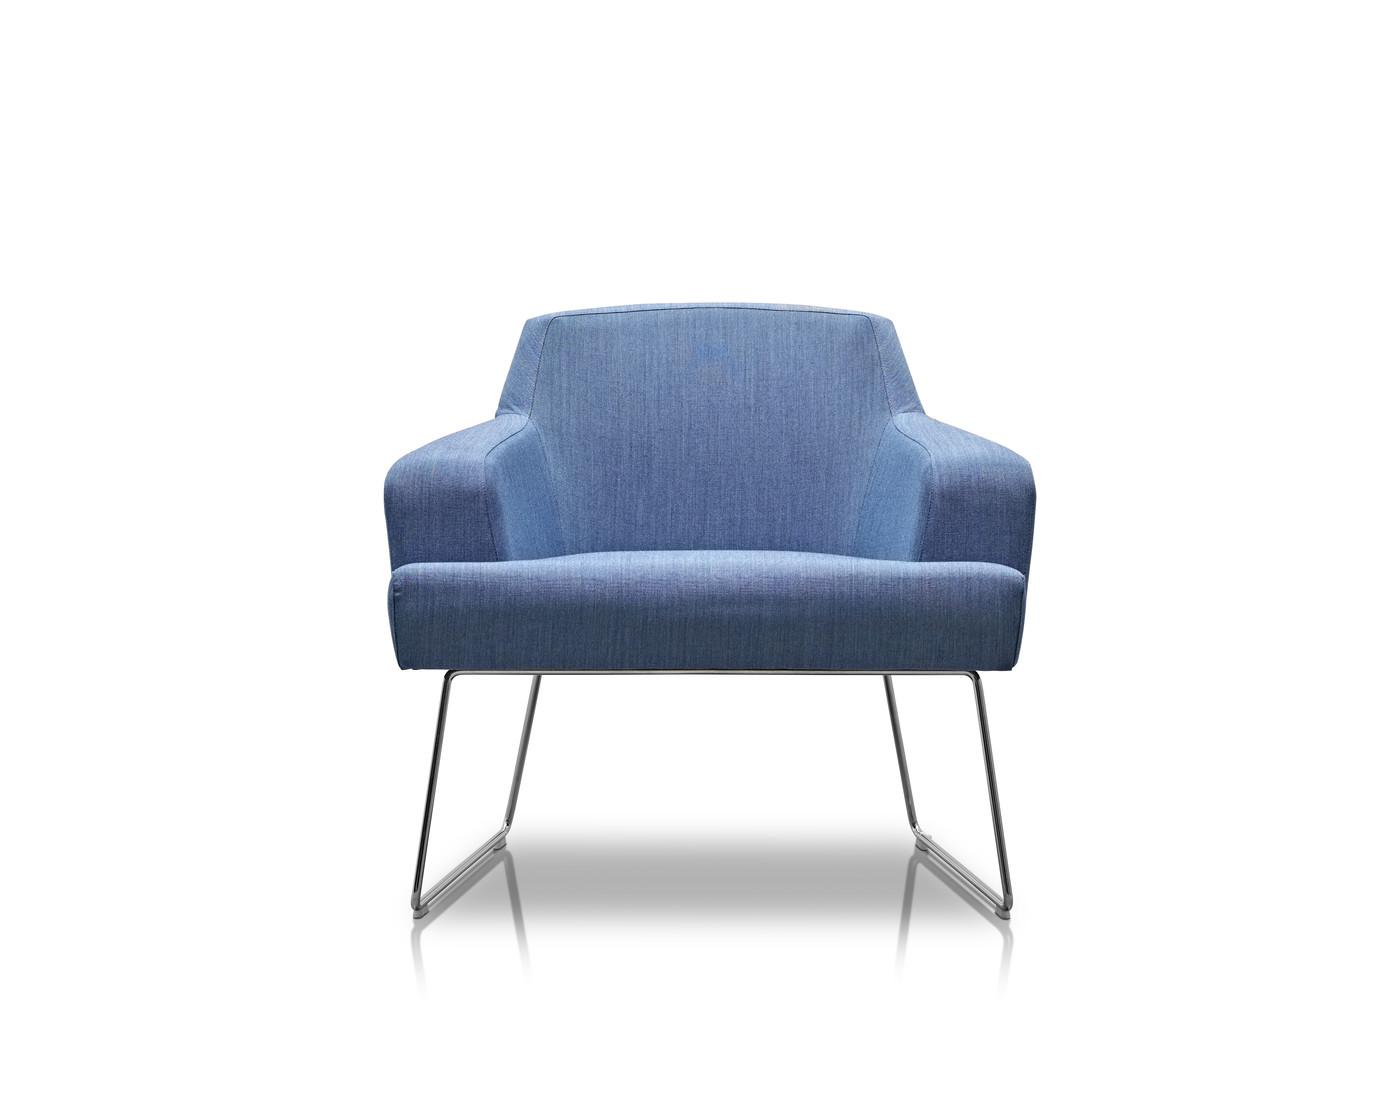 4-Silla-Multiuso-Jetty-Lounge-Frontal-1380